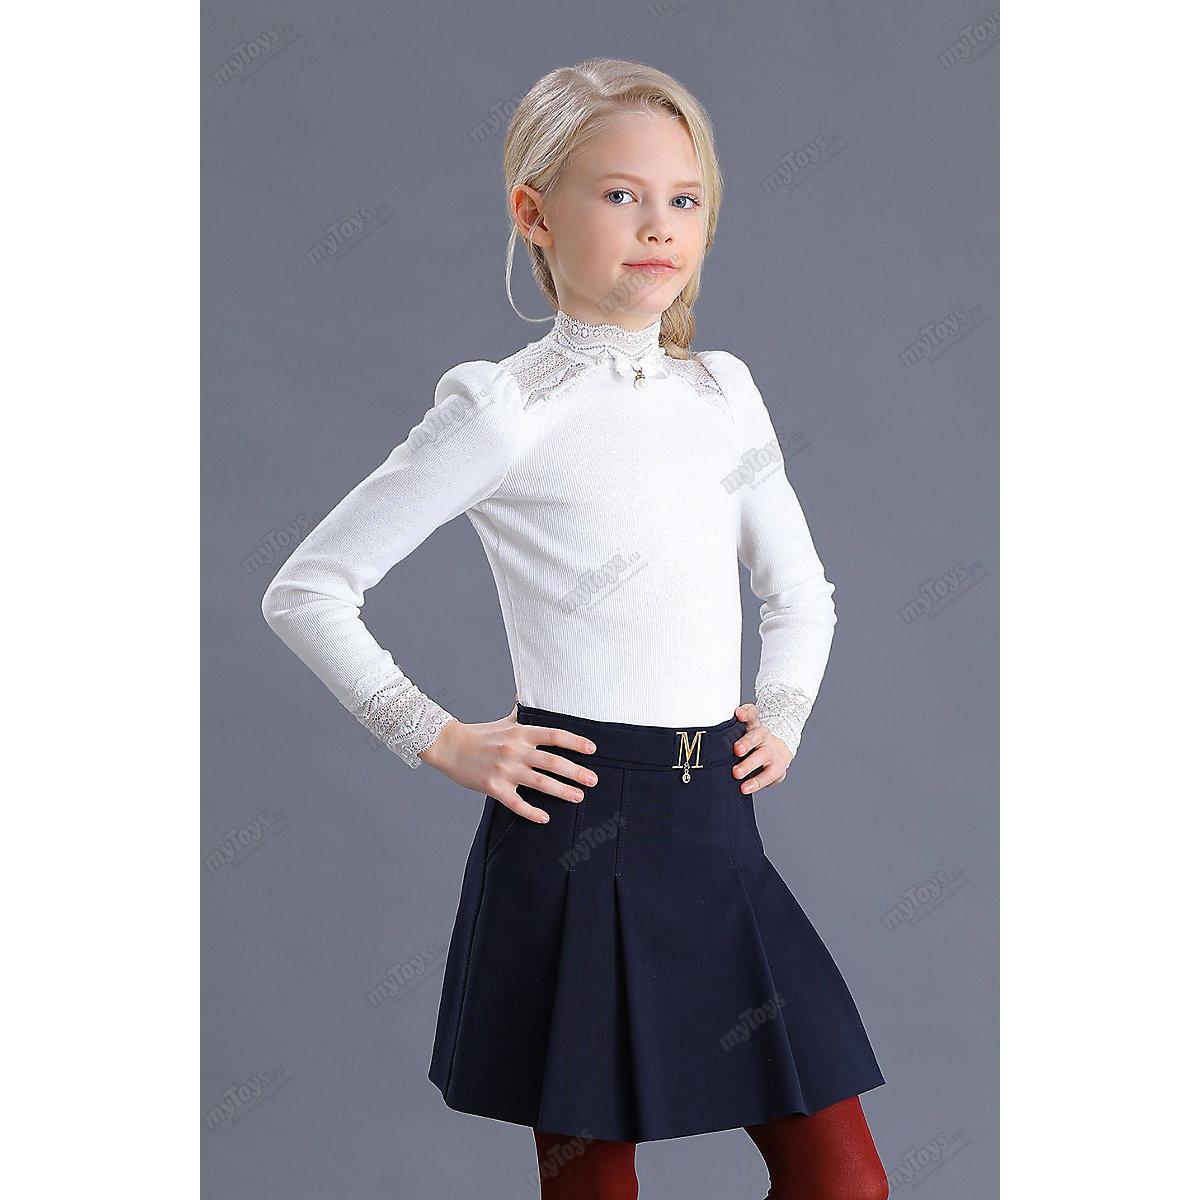 Malenkaya Lady Skirts 11685612 elegant for girls children clothing school uniform color blue Formal  A-Line